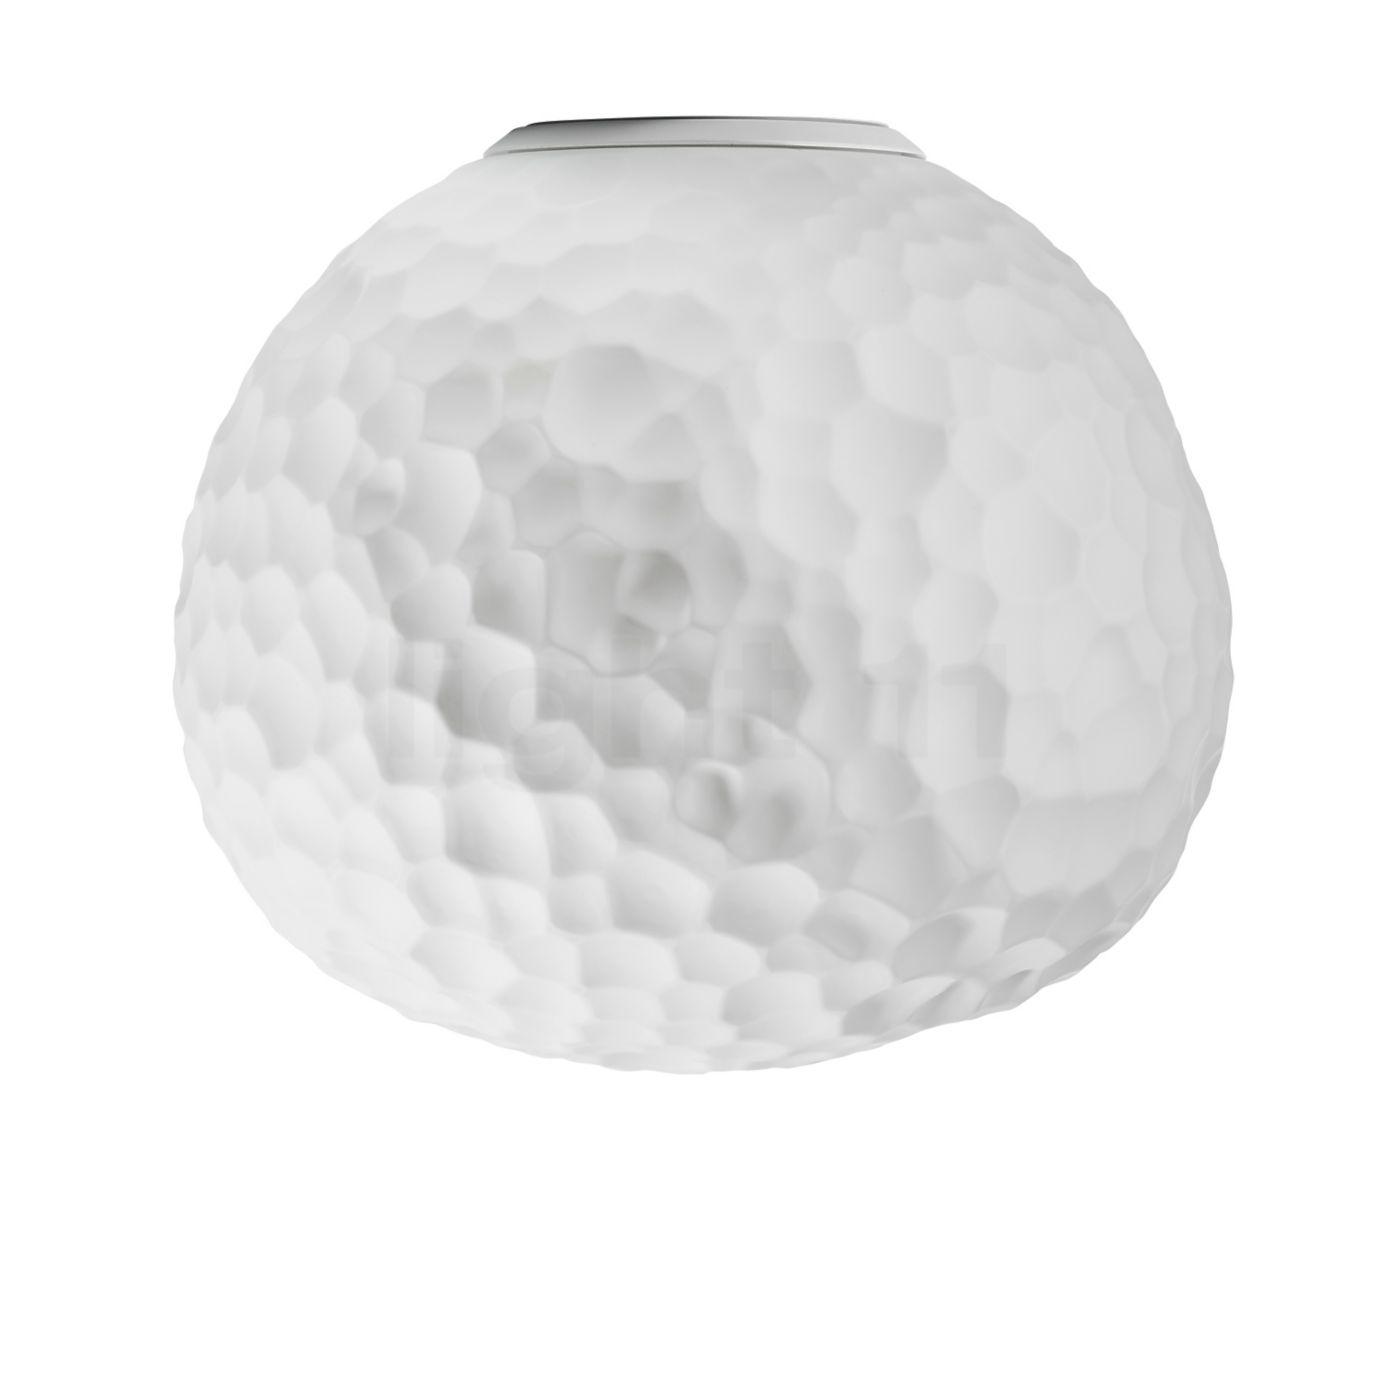 Artemide Meteorite 35 Soffitto/Parete kaufen bei light11.de